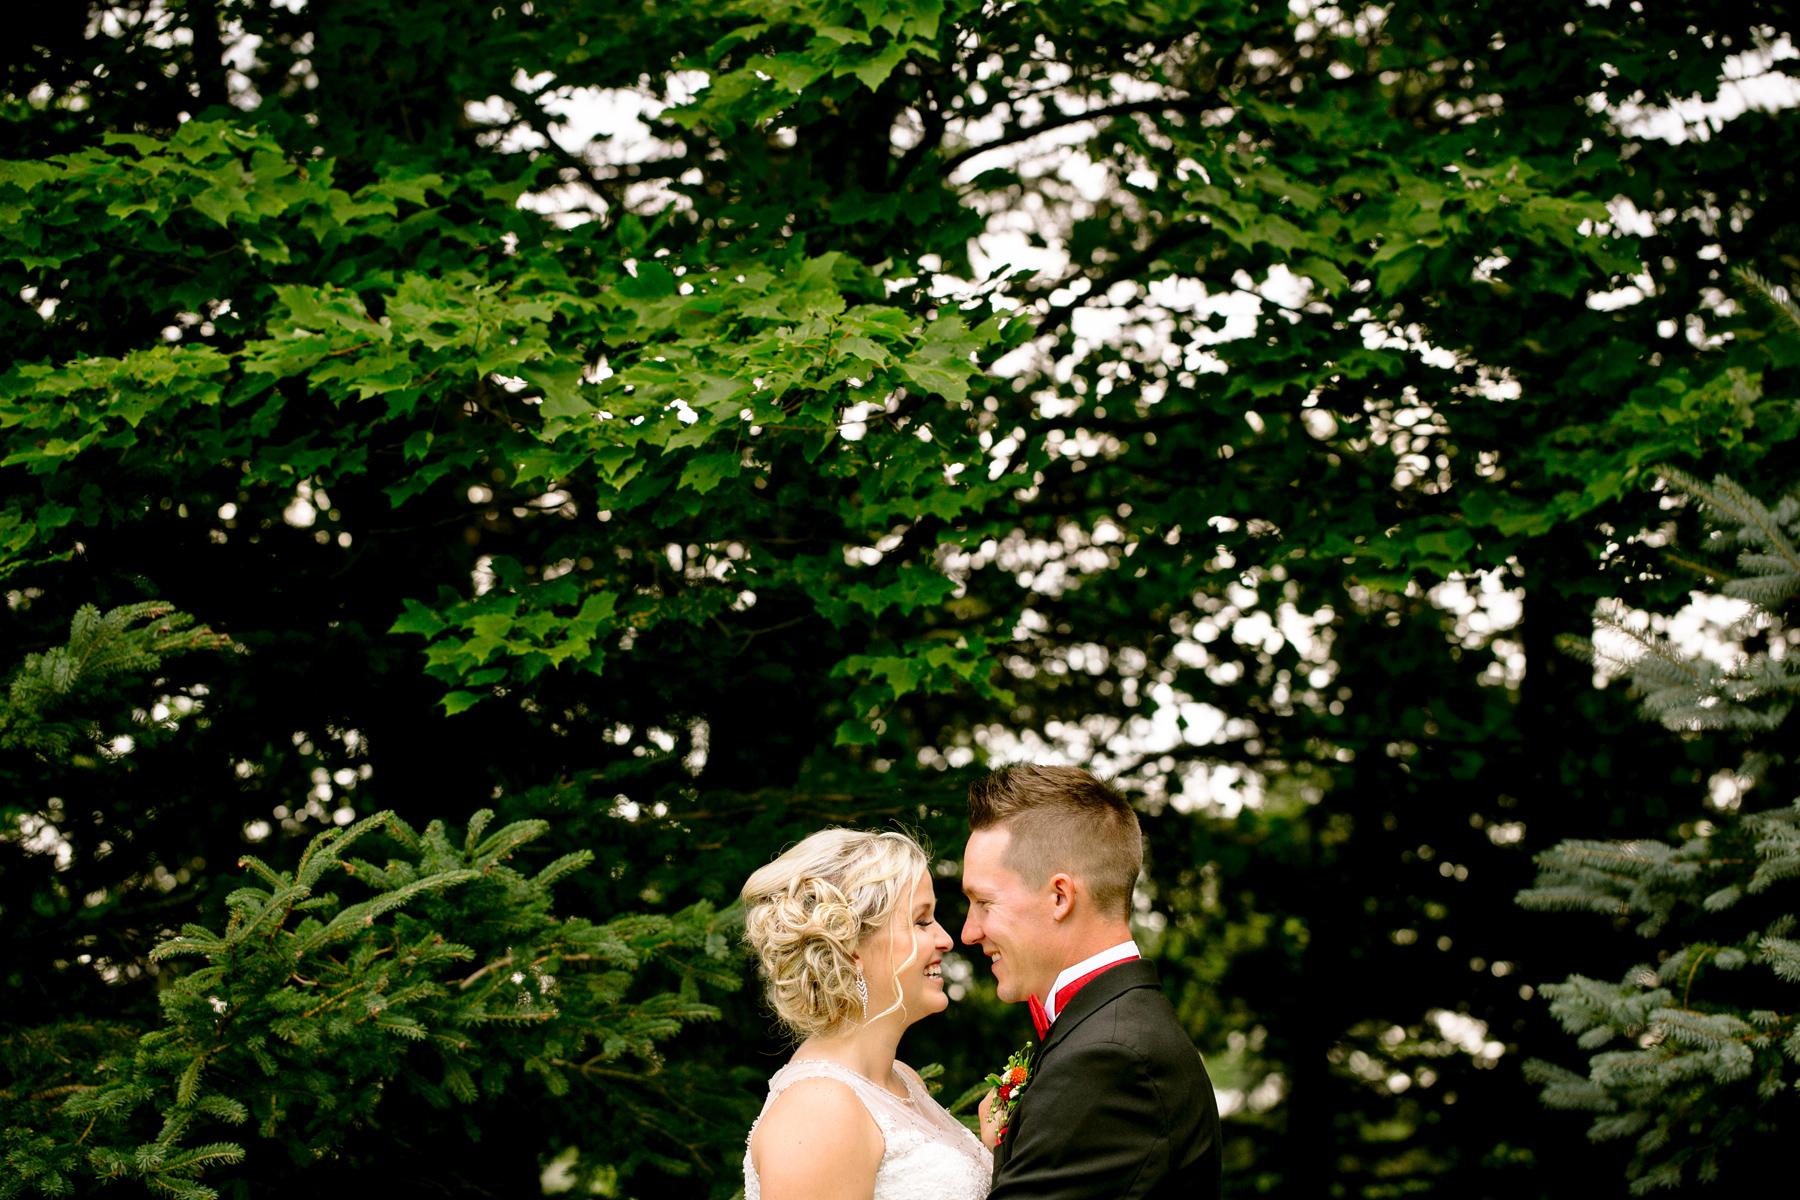 030-awesome-pei-wedding-photography-kandisebrown-jg2016